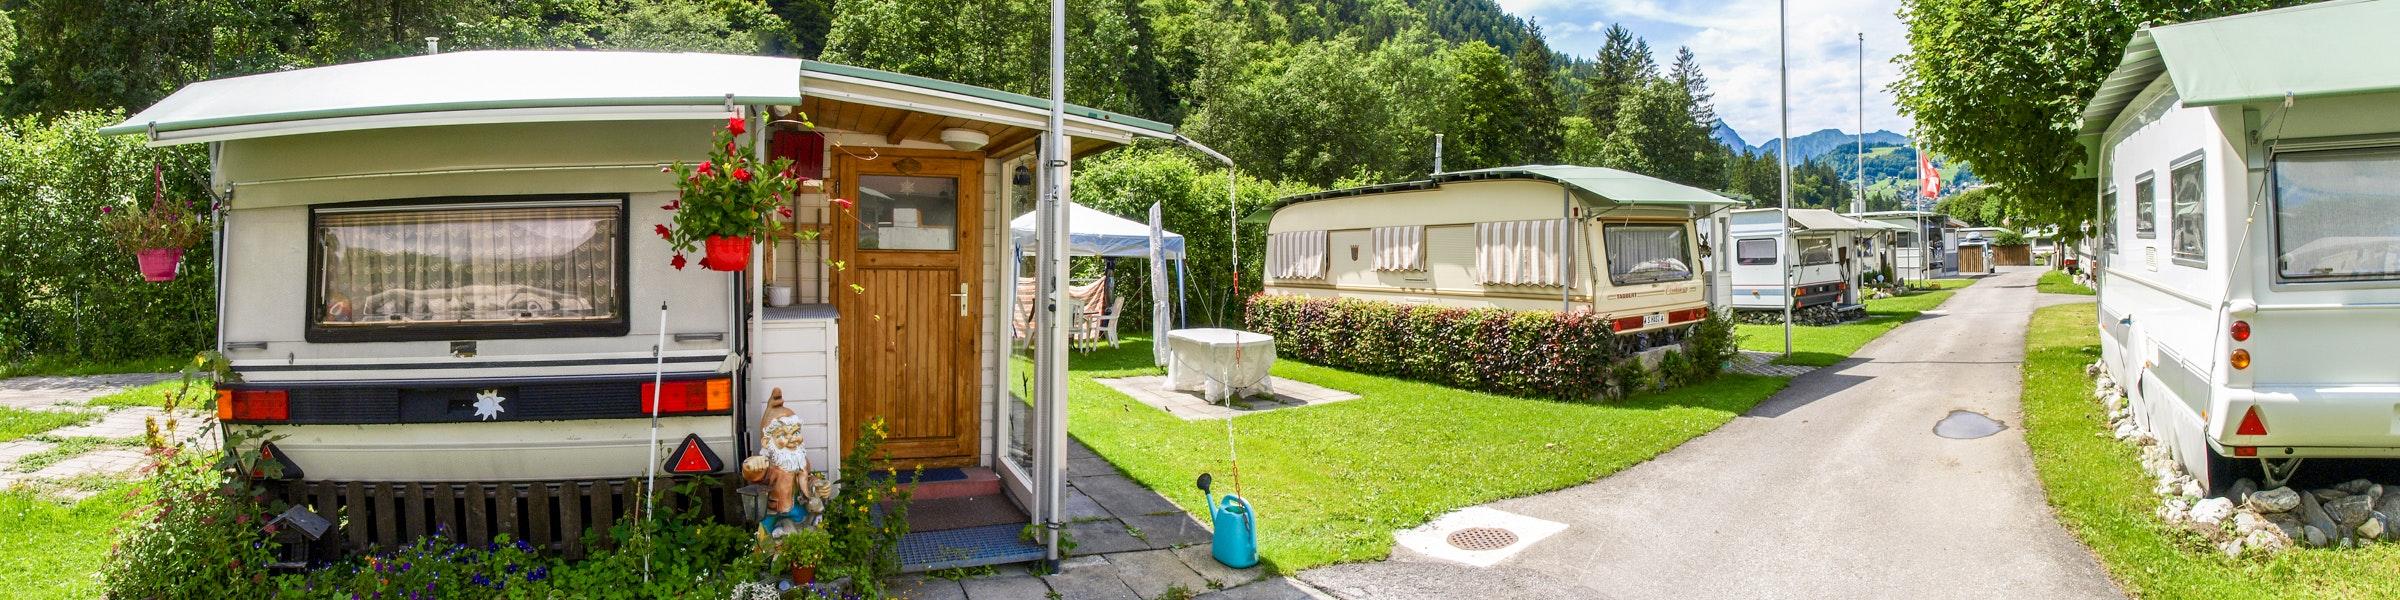 Campsite Engelberg 1